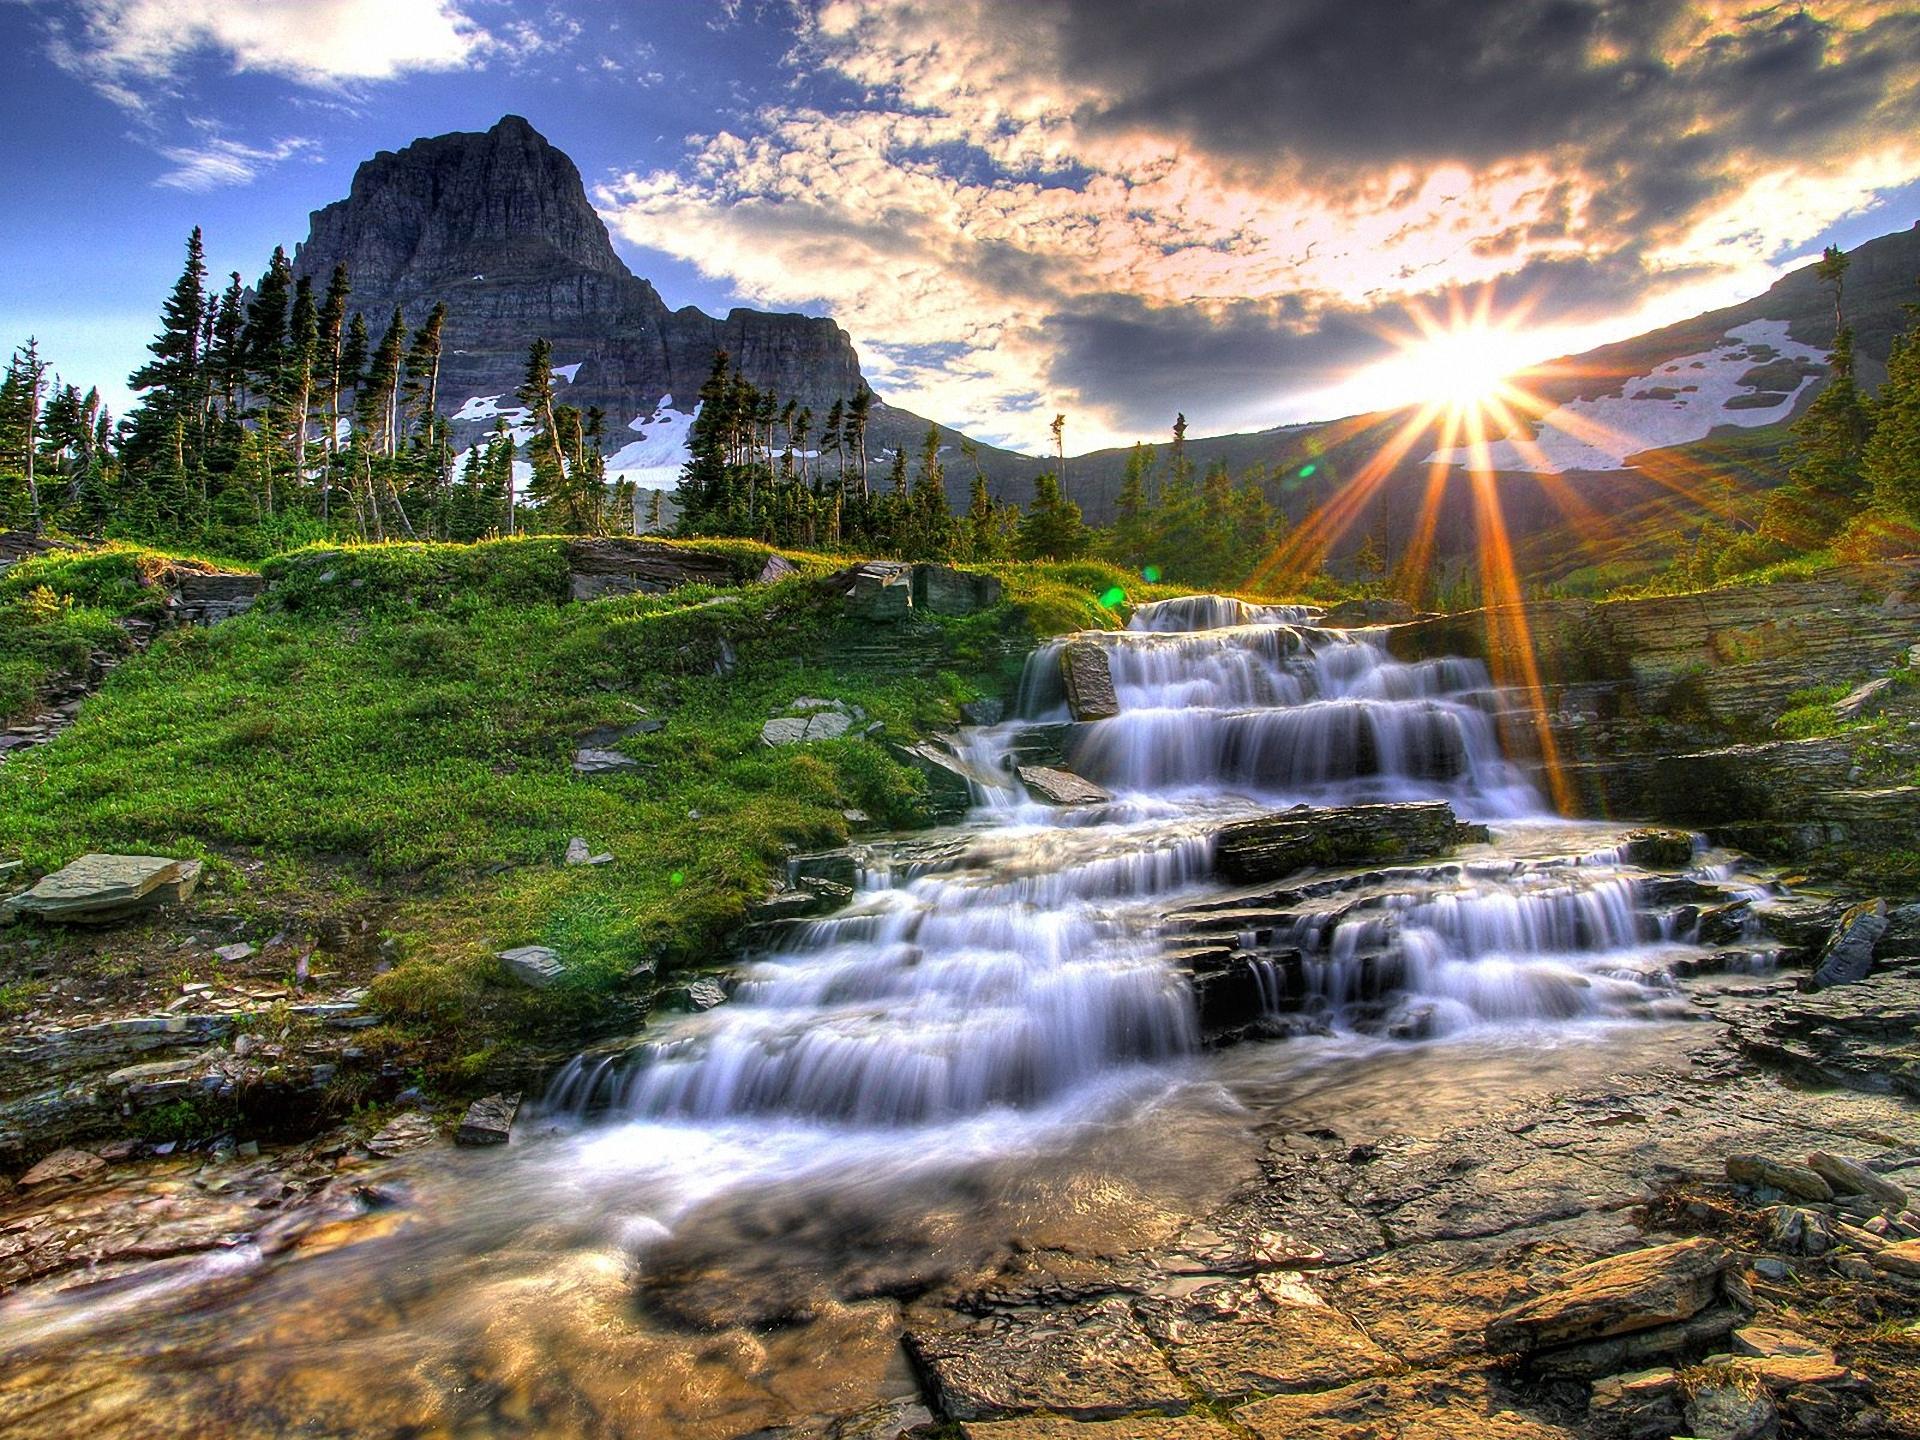 natural waterfalls images